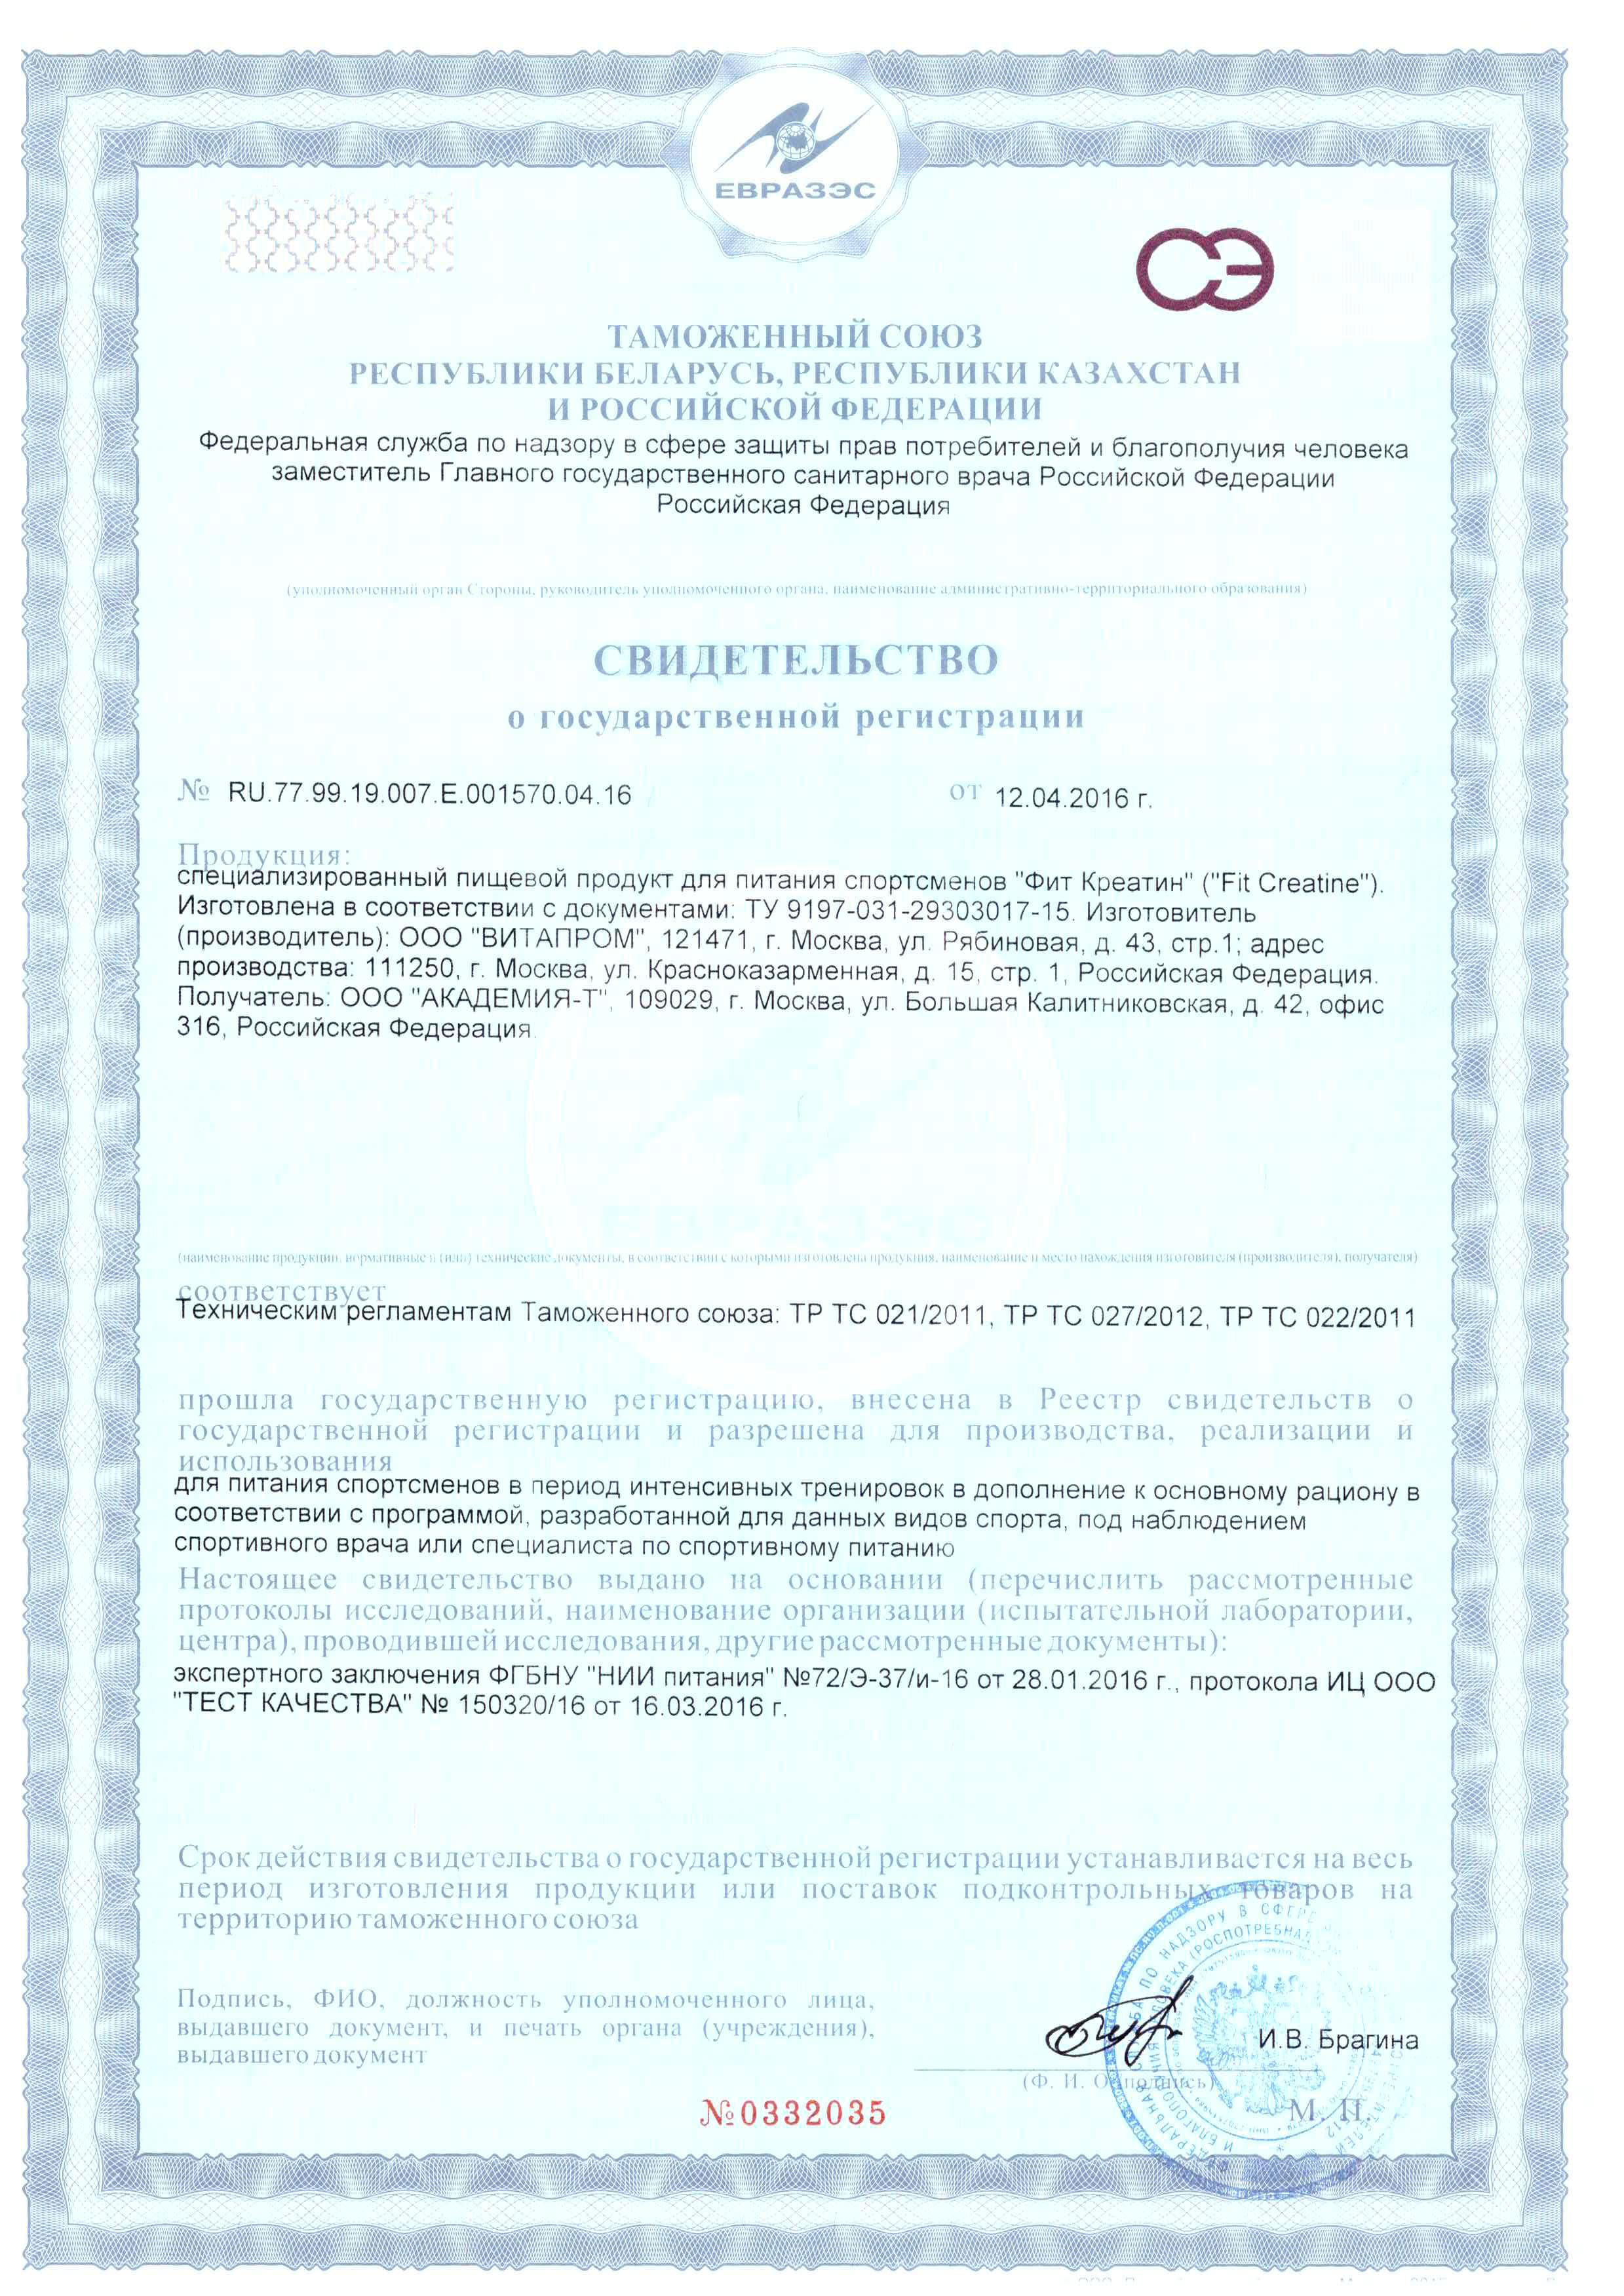 Сертификат FIT CREATINE